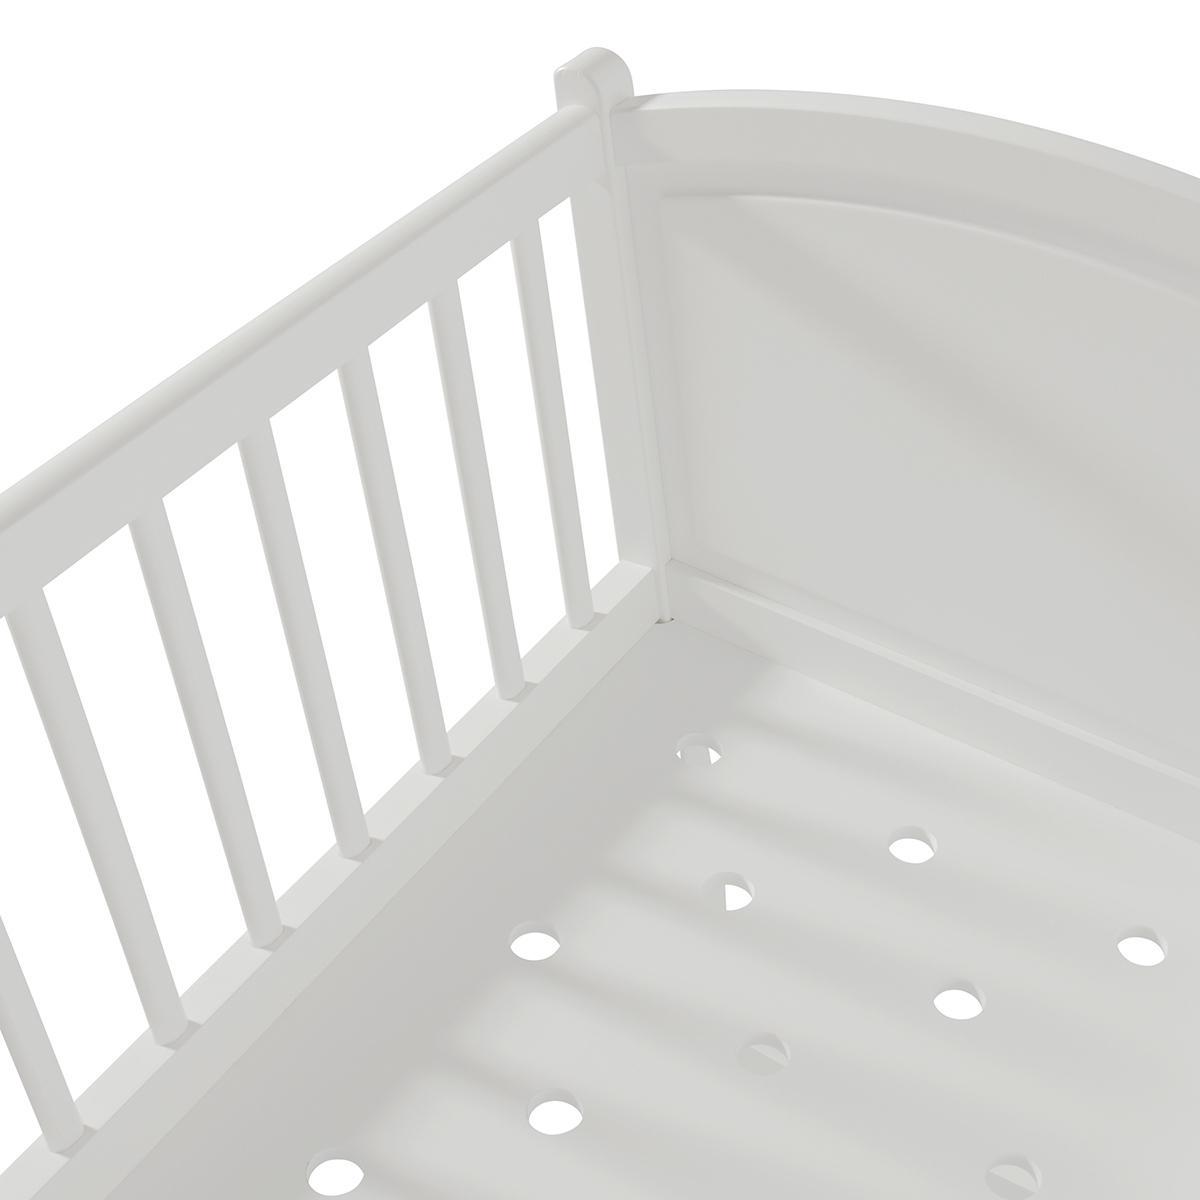 Berceau bébé SEASIDE Oliver Furniture blanc